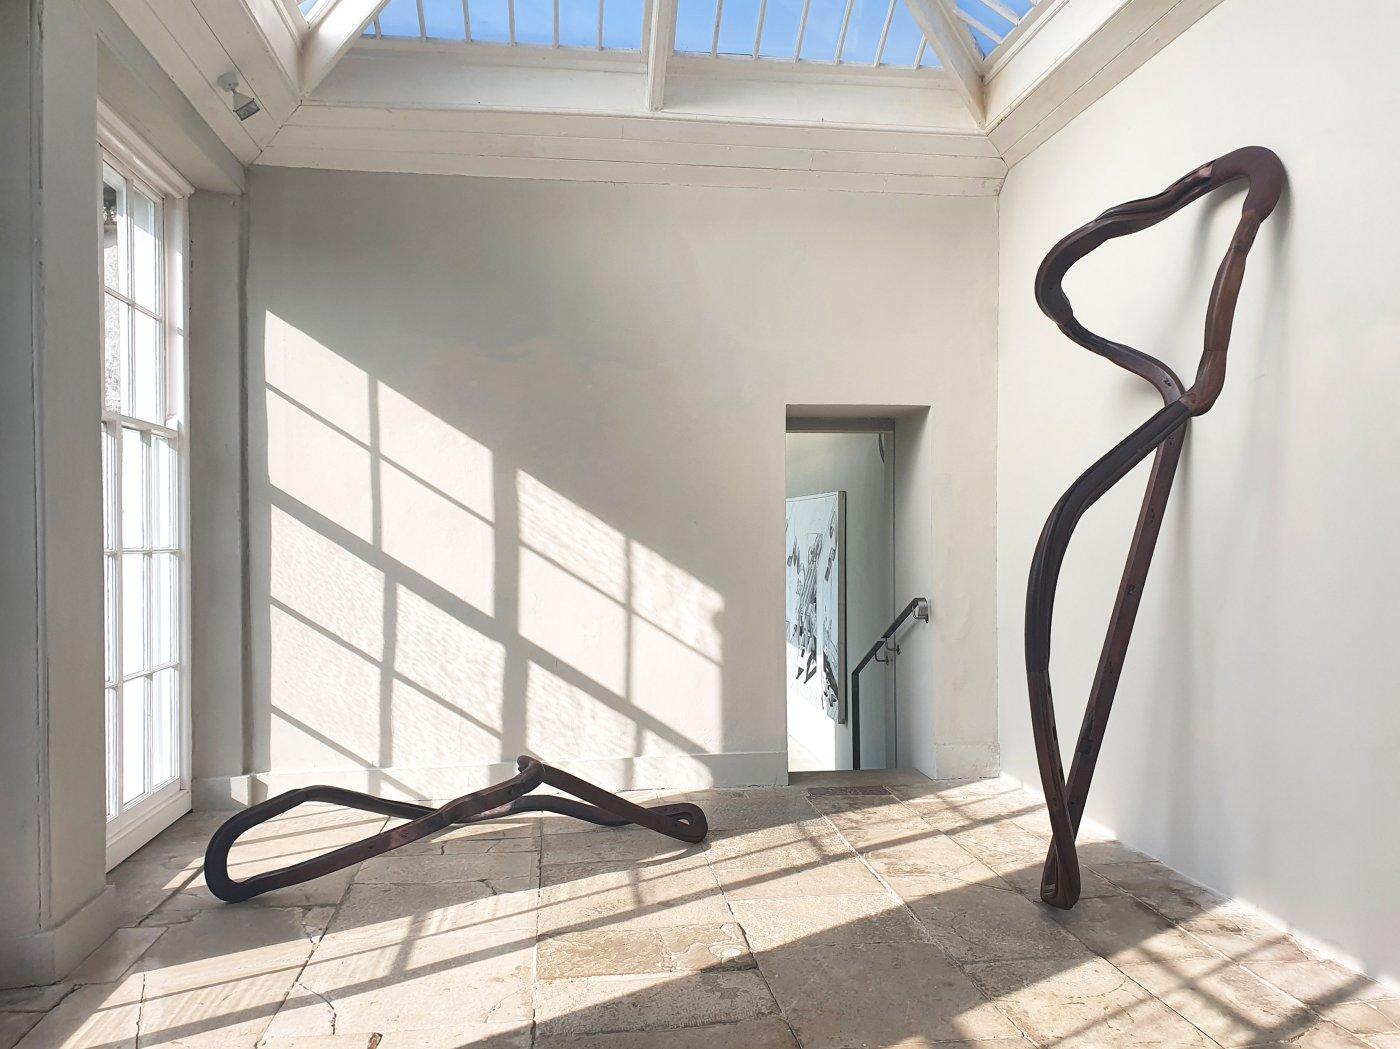 New Art Centre Edward Allington Nika Neelova 7